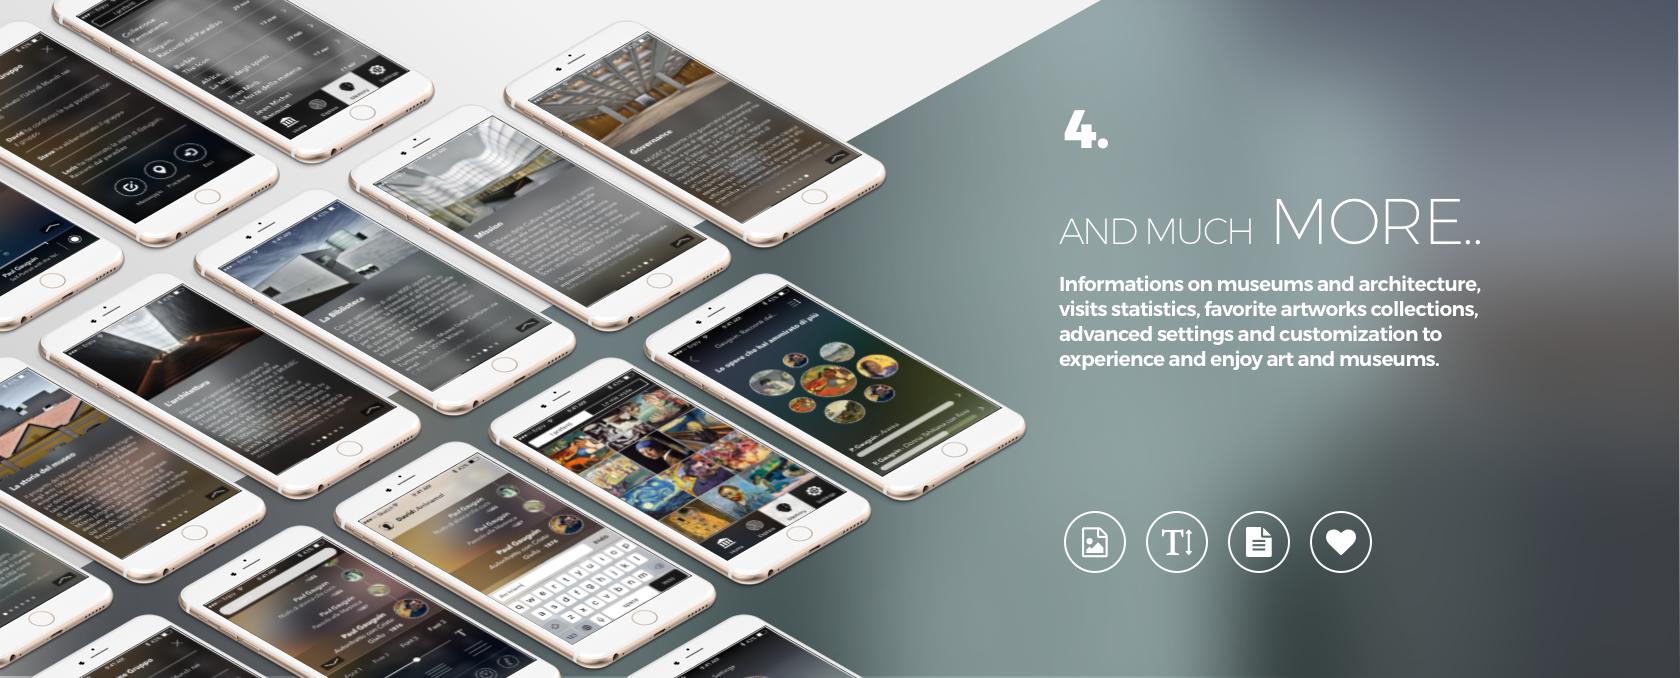 Enjoymuseum. Museum experience design - Fabio Besti - App concept 4